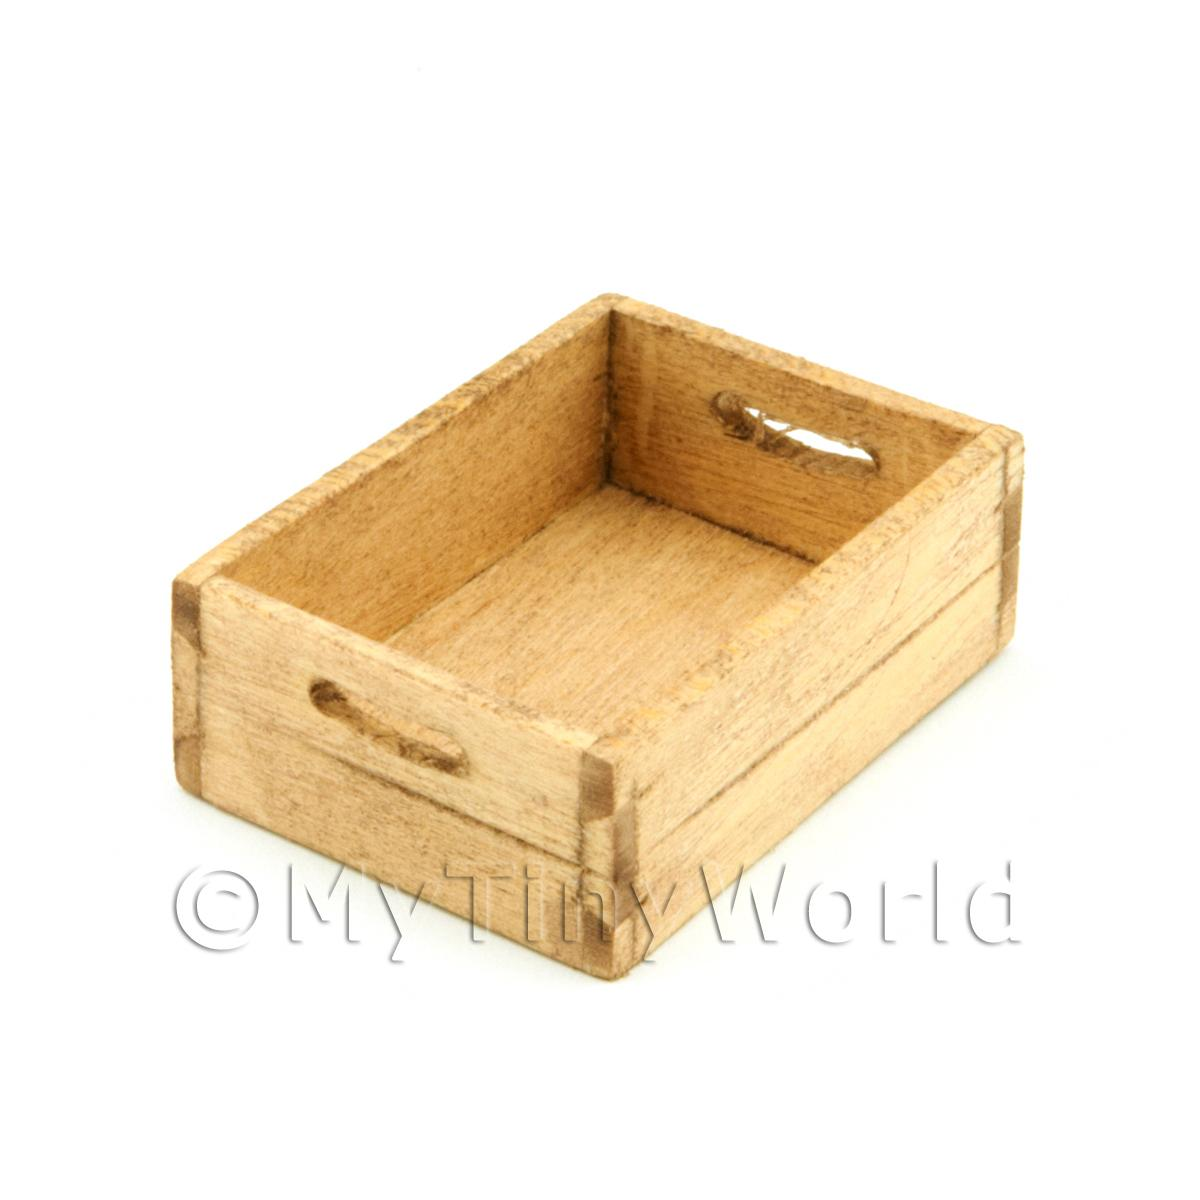 Wood Bottle Crates Dolls House Miniature Mytinyworld